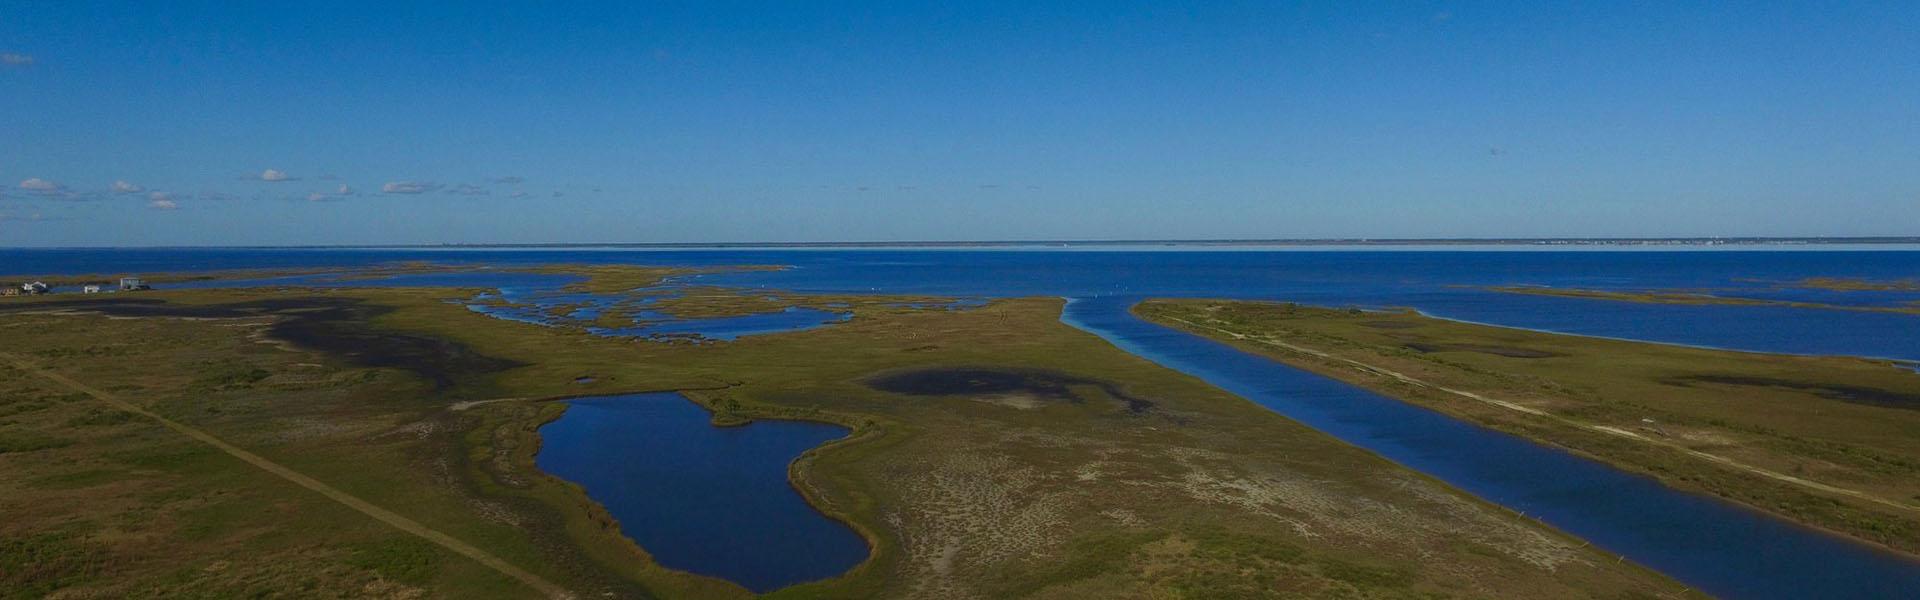 Arial View of Coastal Heritage Preserve